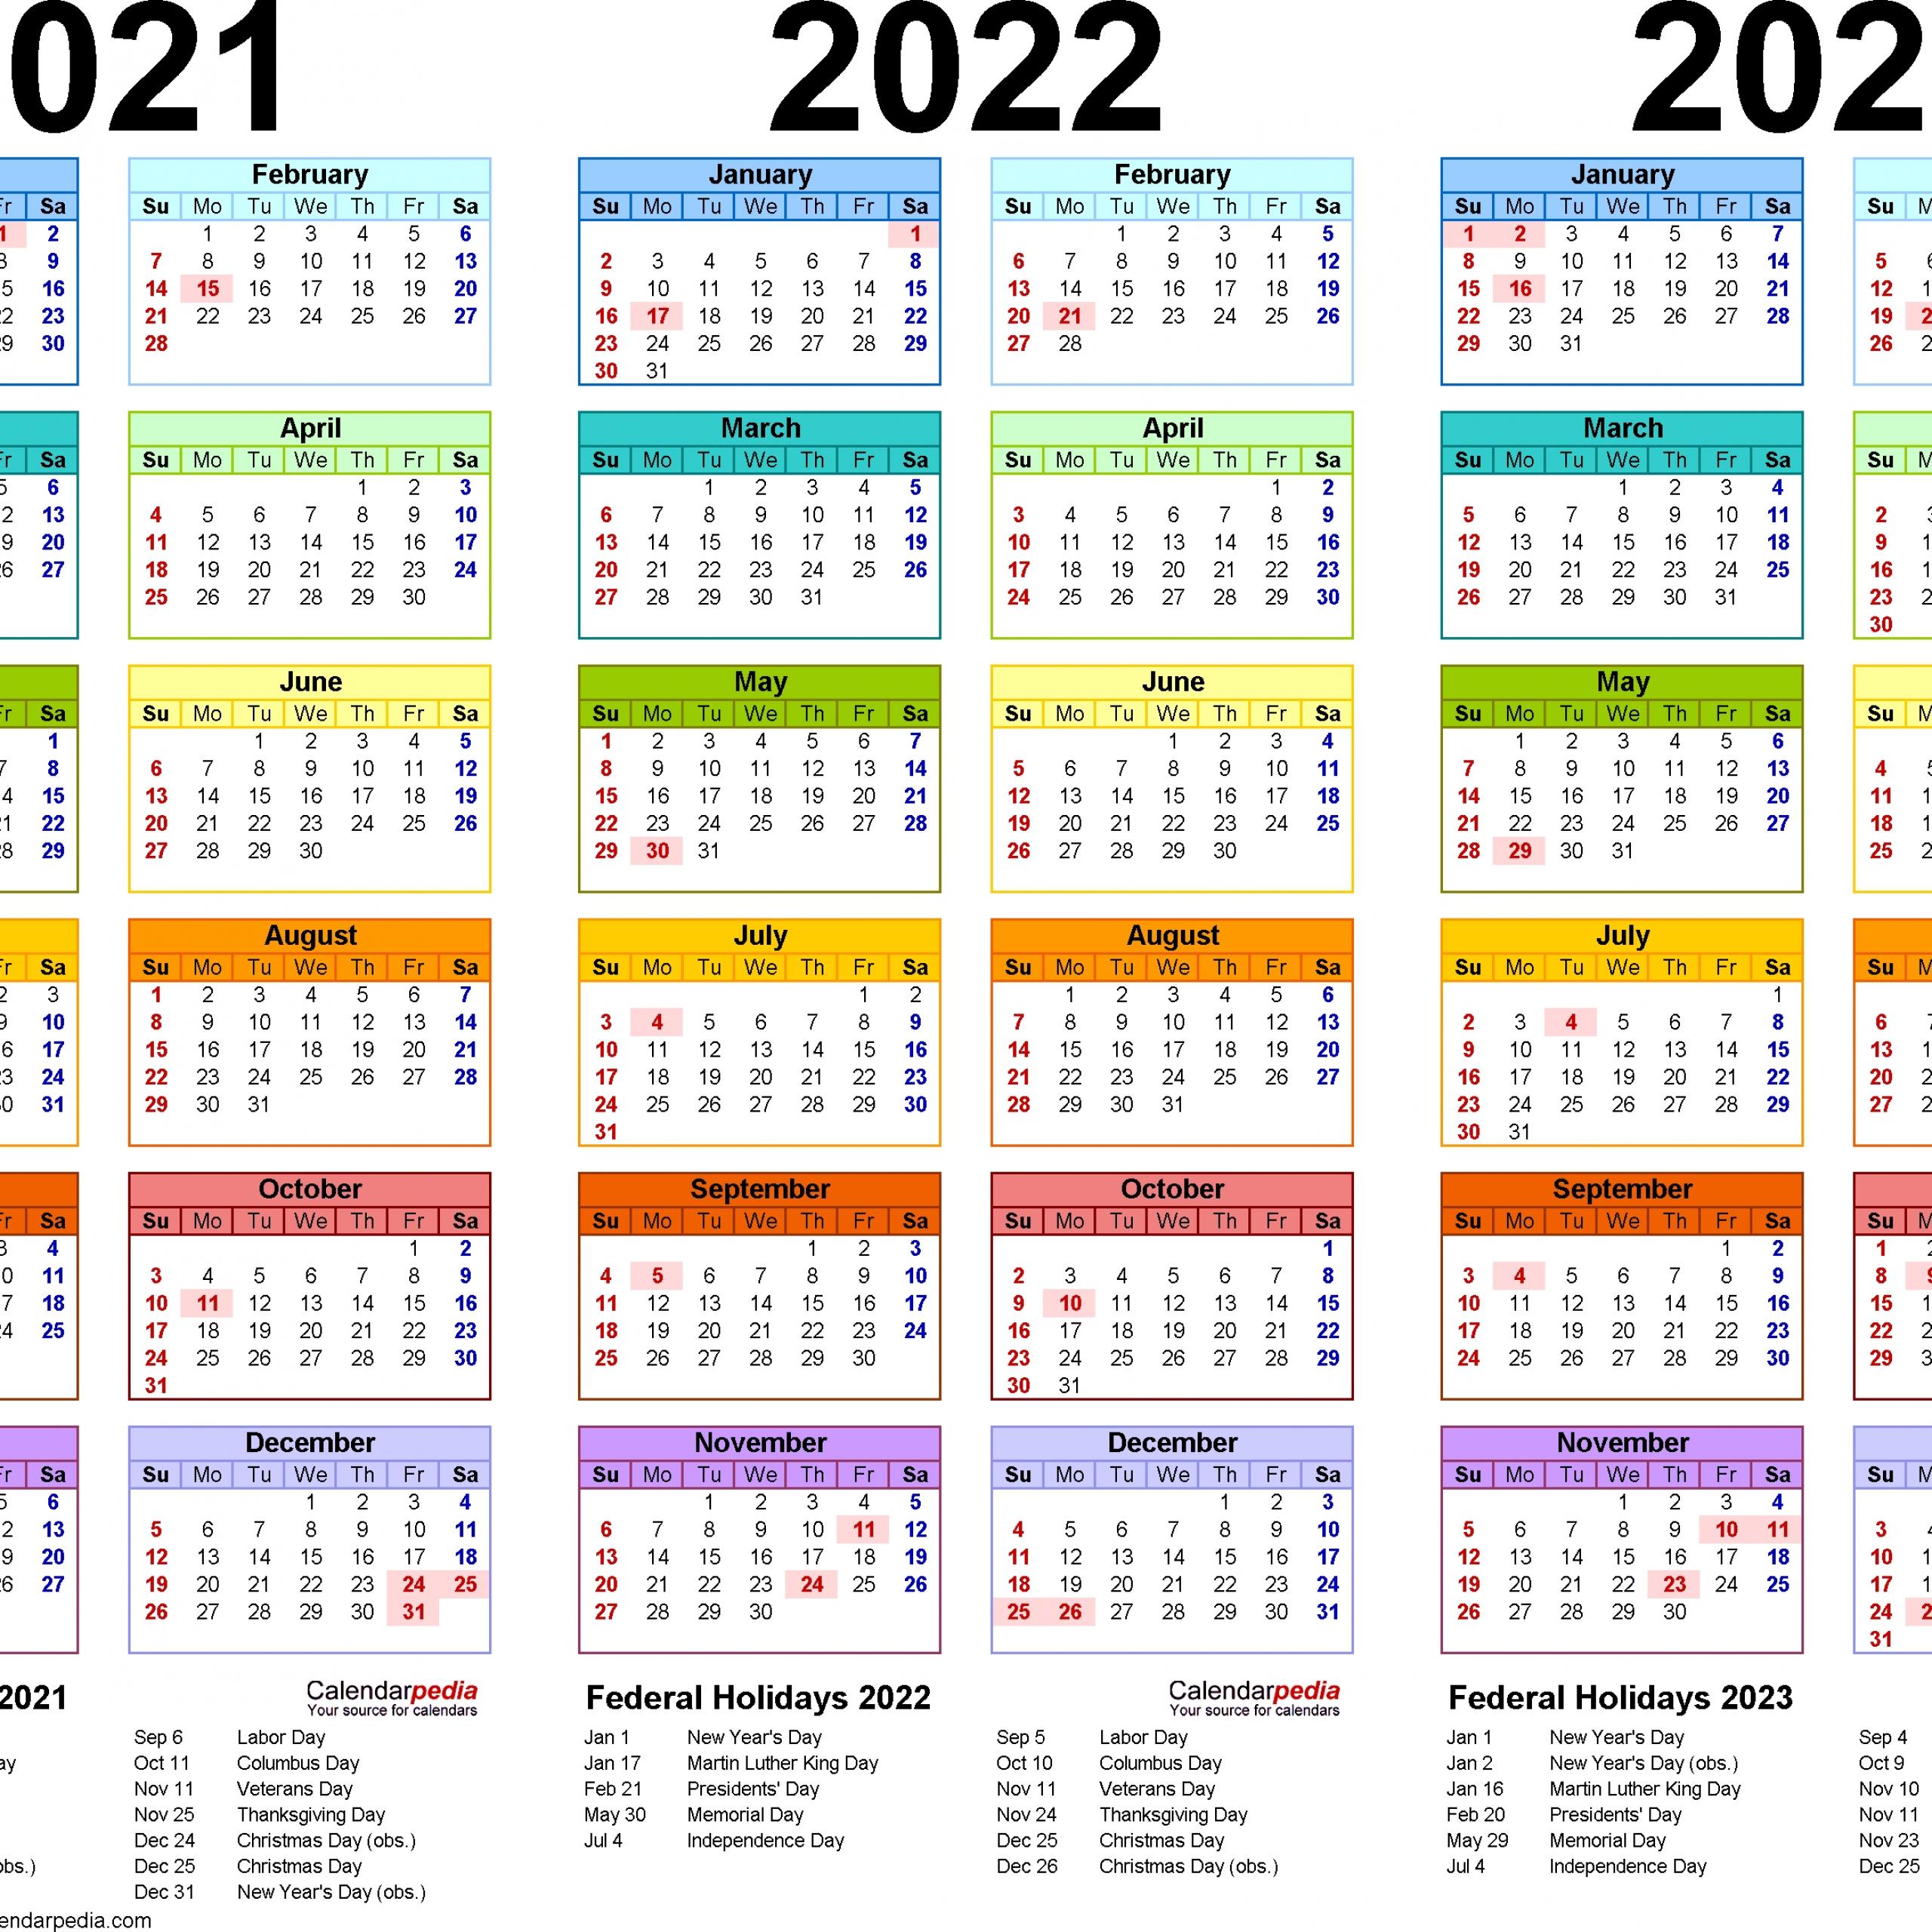 Calendar 2021 Philippines Holidays | Avnitasoni-Philippine 2021 Calendar.pdf